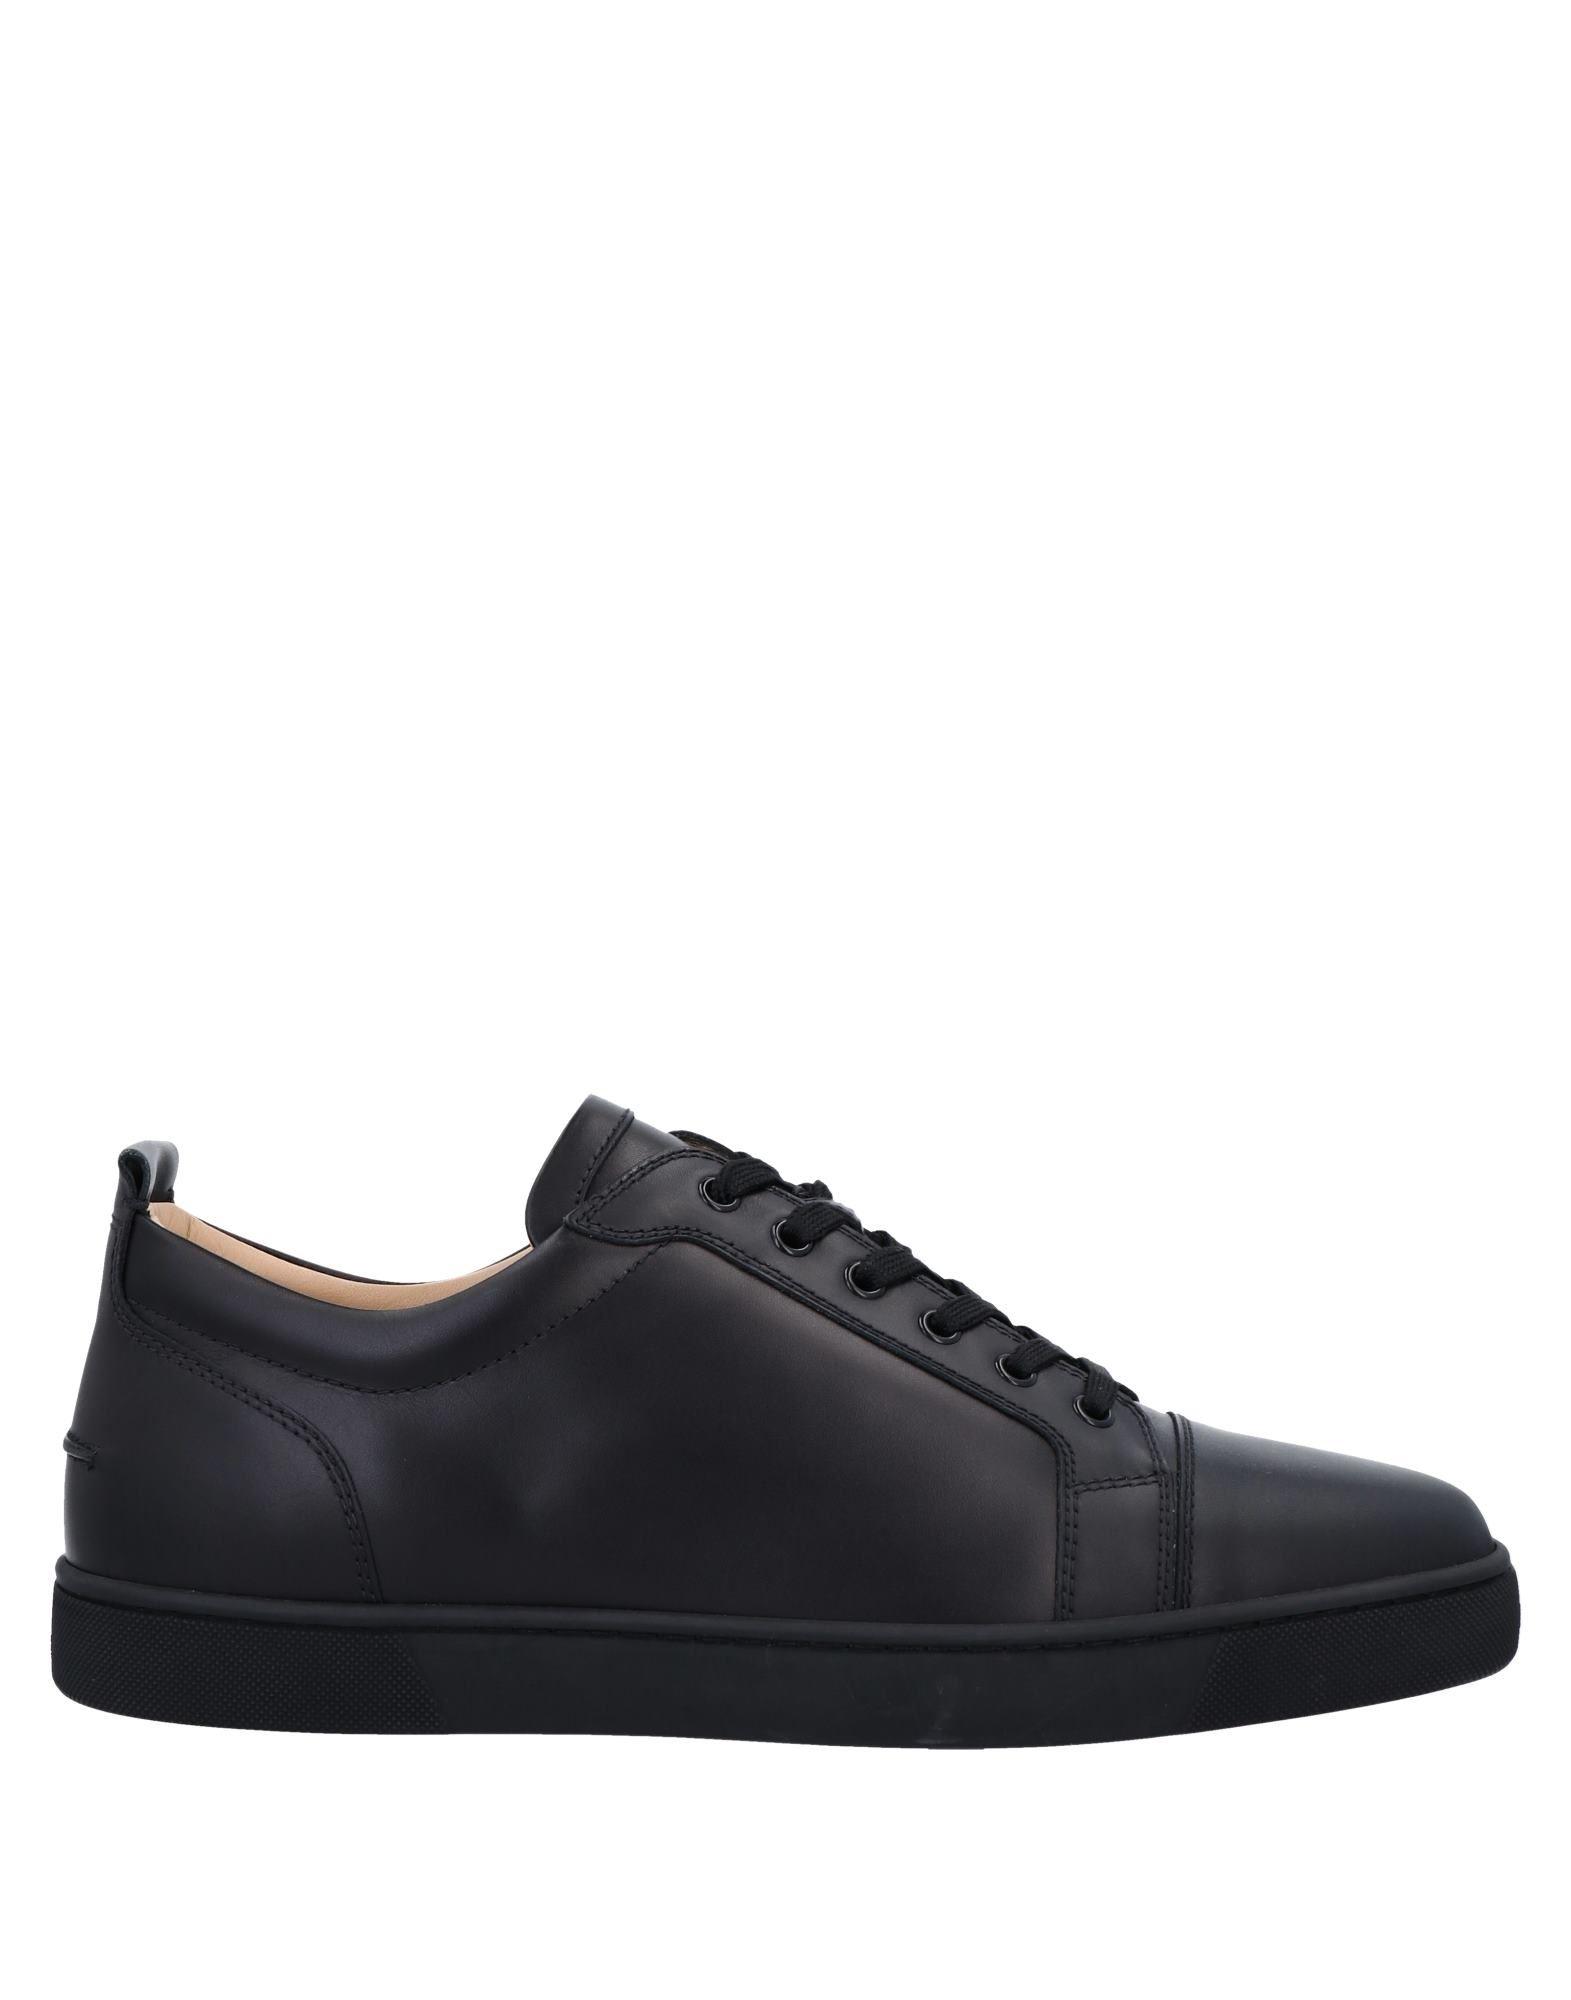 CHRISTIAN LOUBOUTIN Low-tops & sneakers - Item 17004027